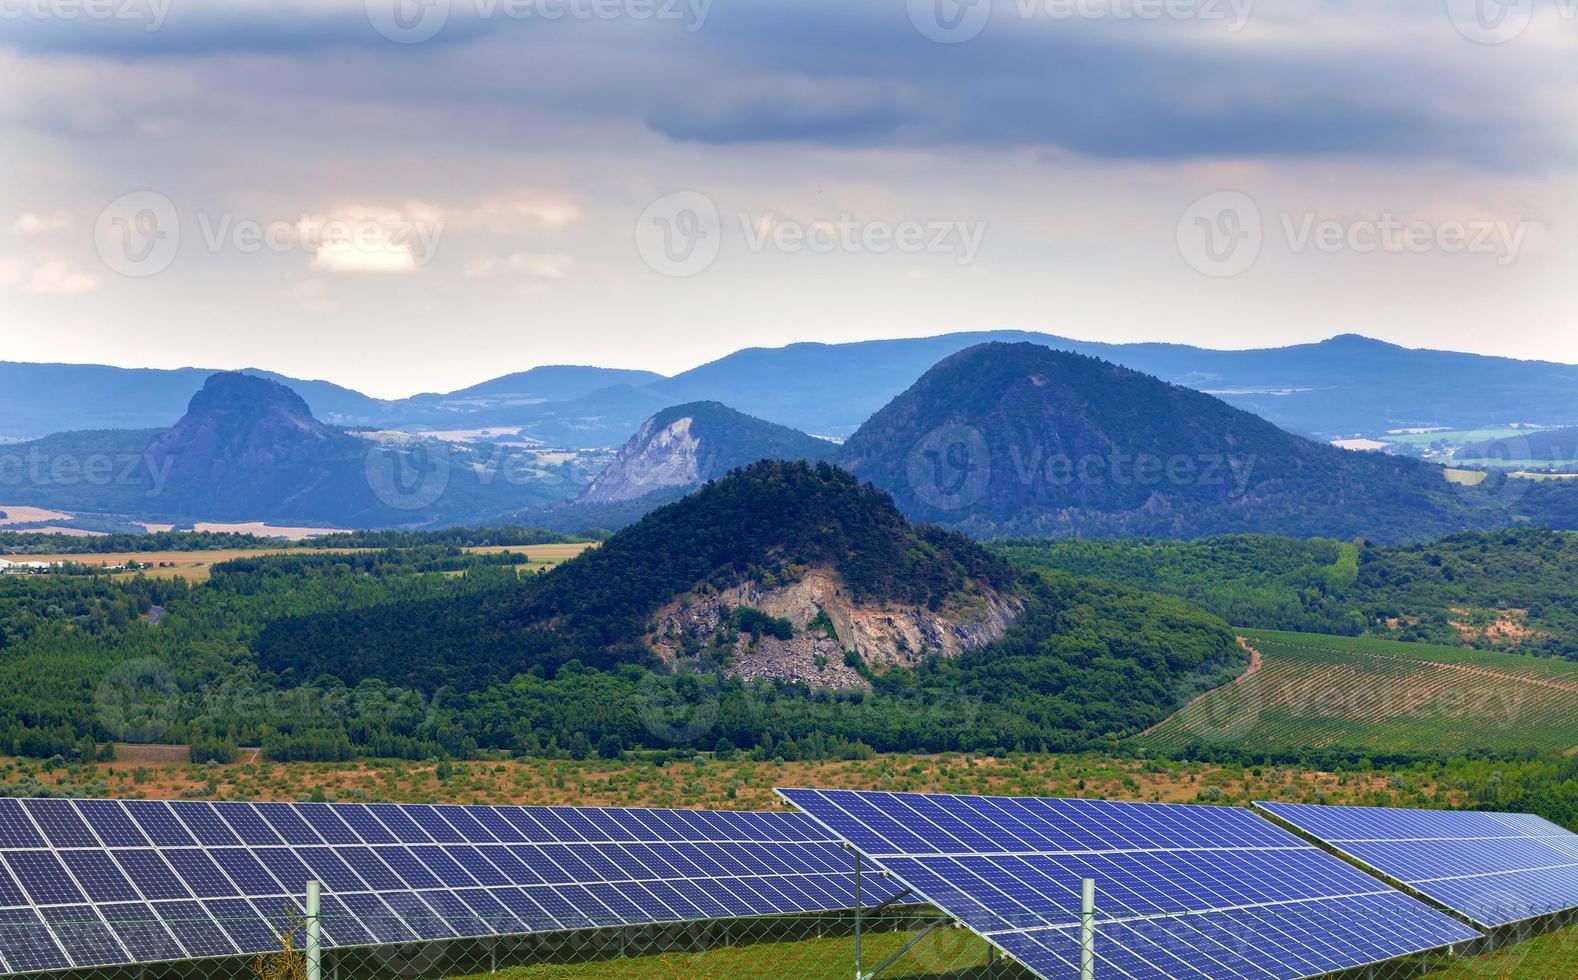 Landscape with solar panels photo